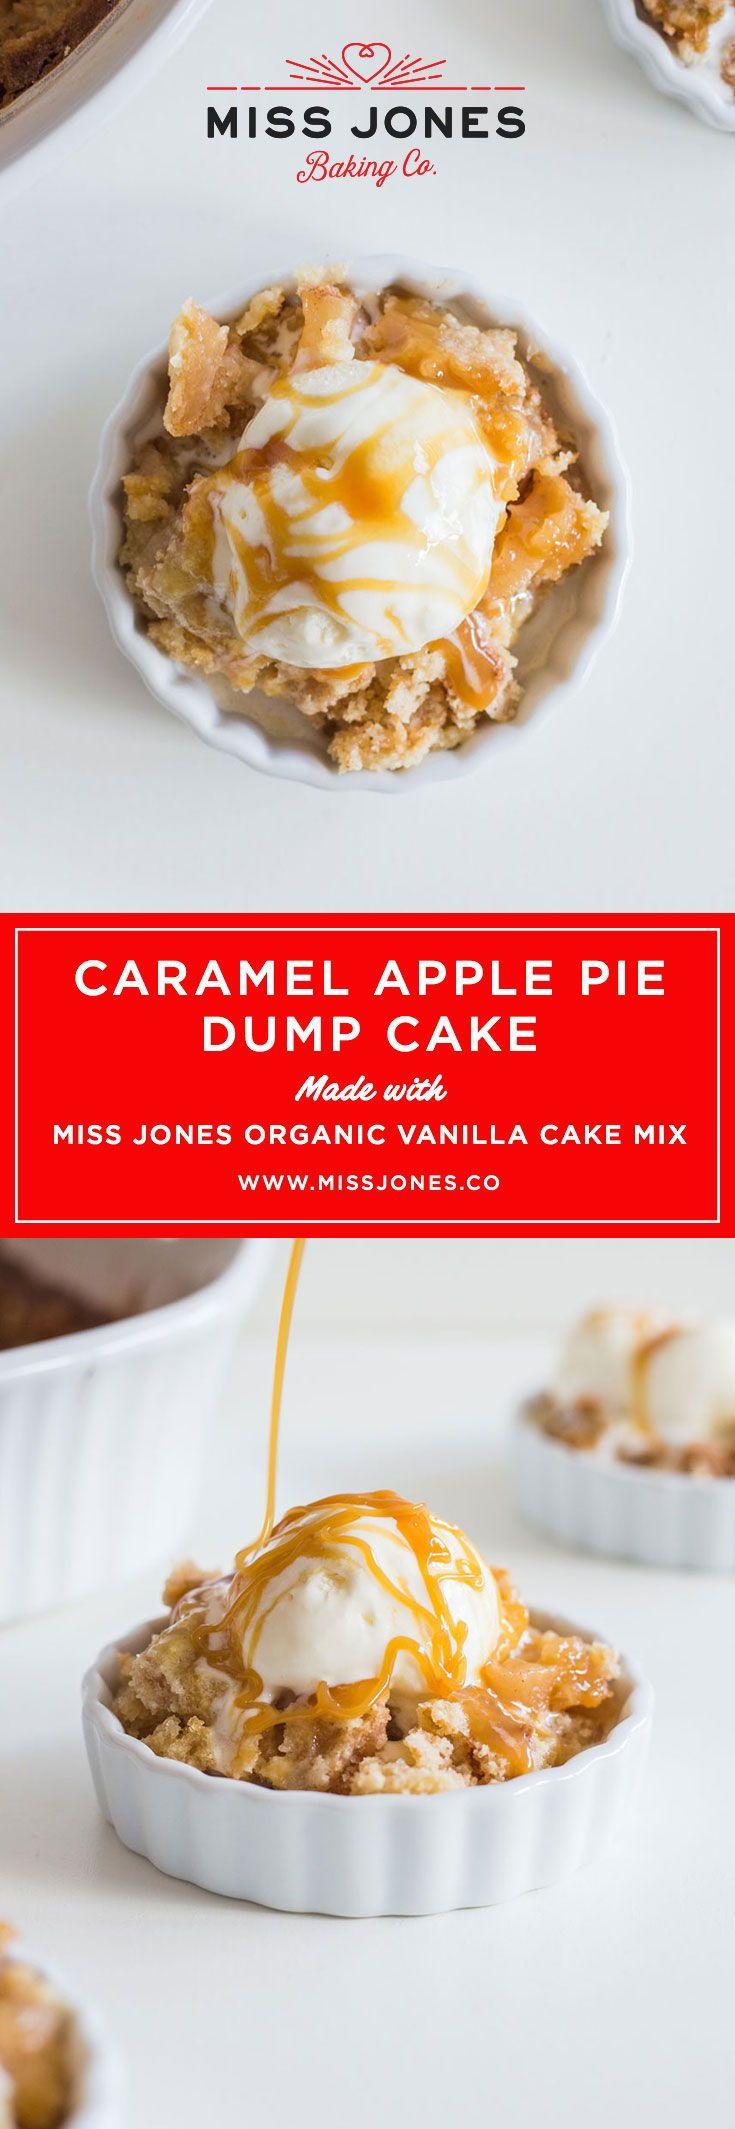 Caramel apple pie dump cake recipe caramel apples